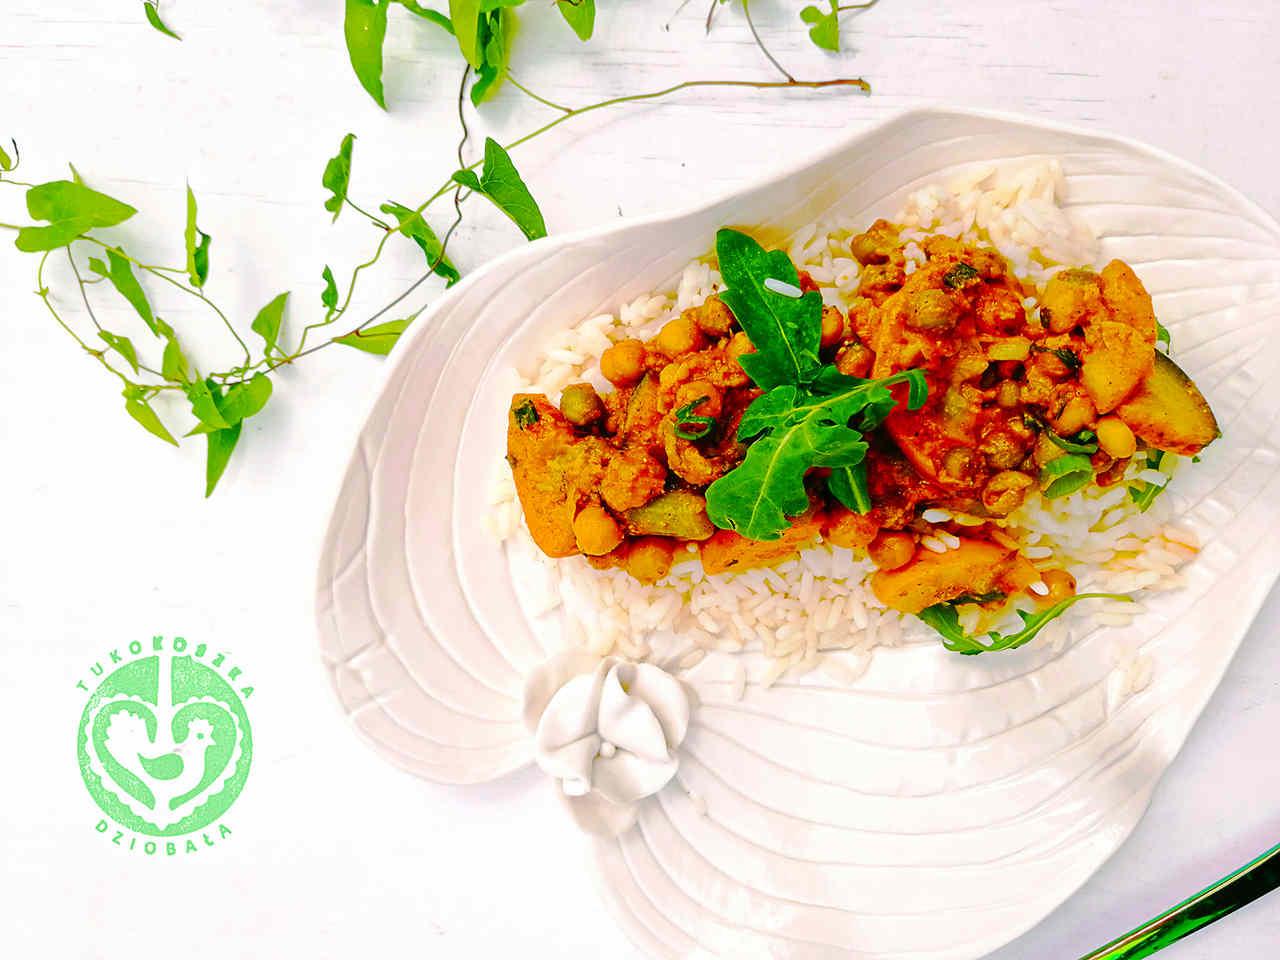 Catering-dietetyczny-weganski-wegetarianski-wege-wegan-